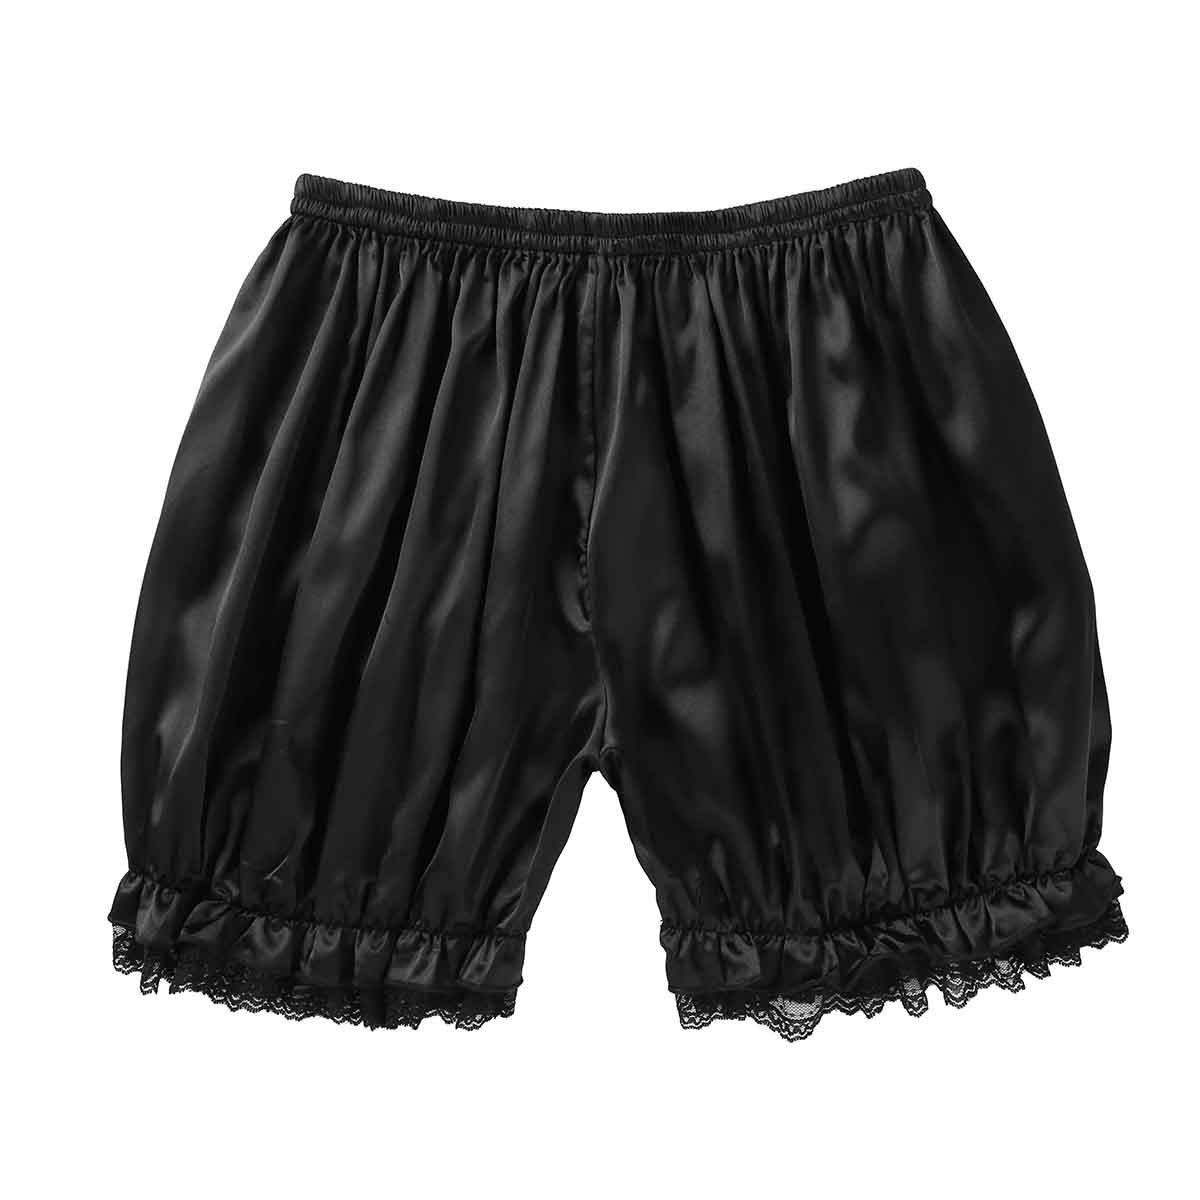 3d5702cf7b YiZYiF Men s Silky Shiny Satin Flutter Ruffled Sissy Thongs Crossdress  Underwear at Amazon Men s Clothing store